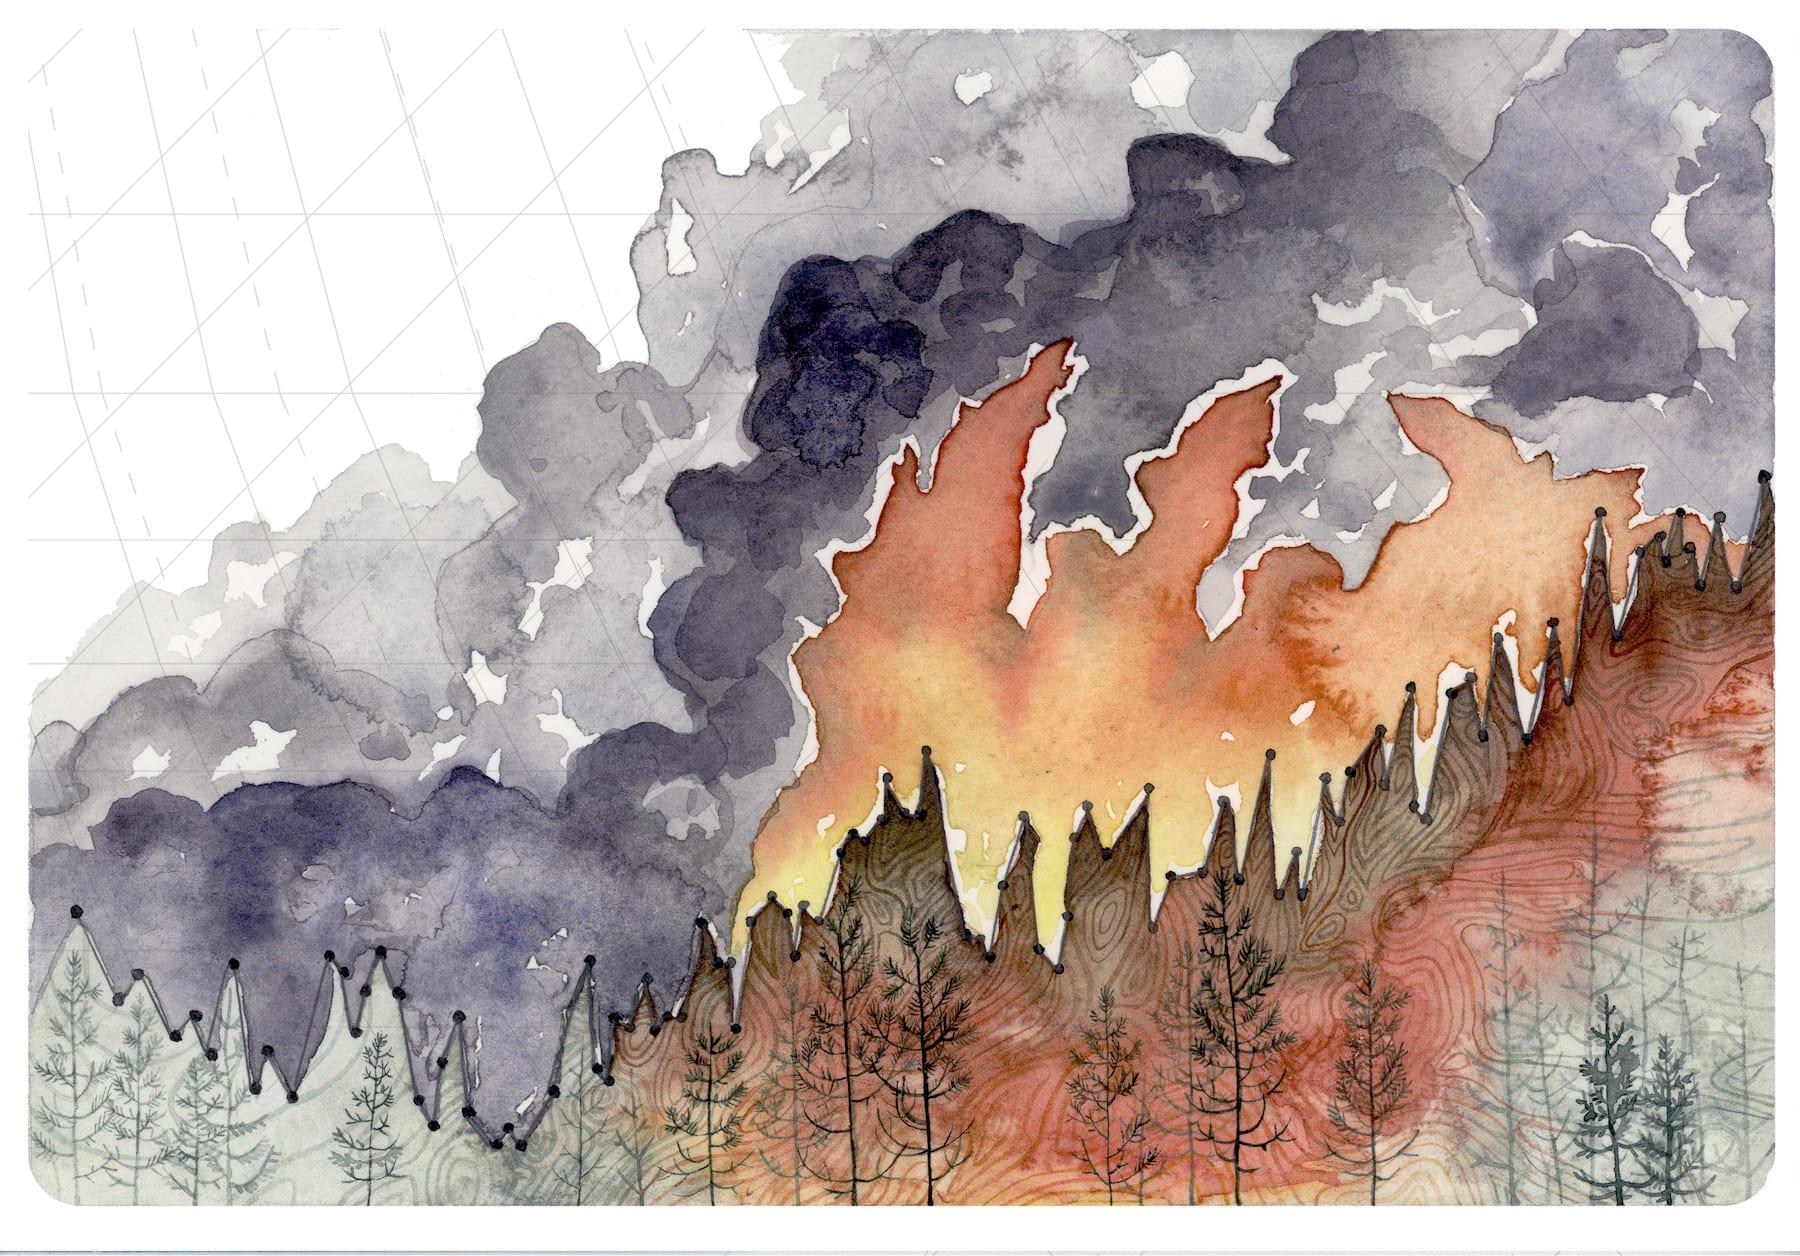 5 proyectos de arte que emergen de la crisis climática